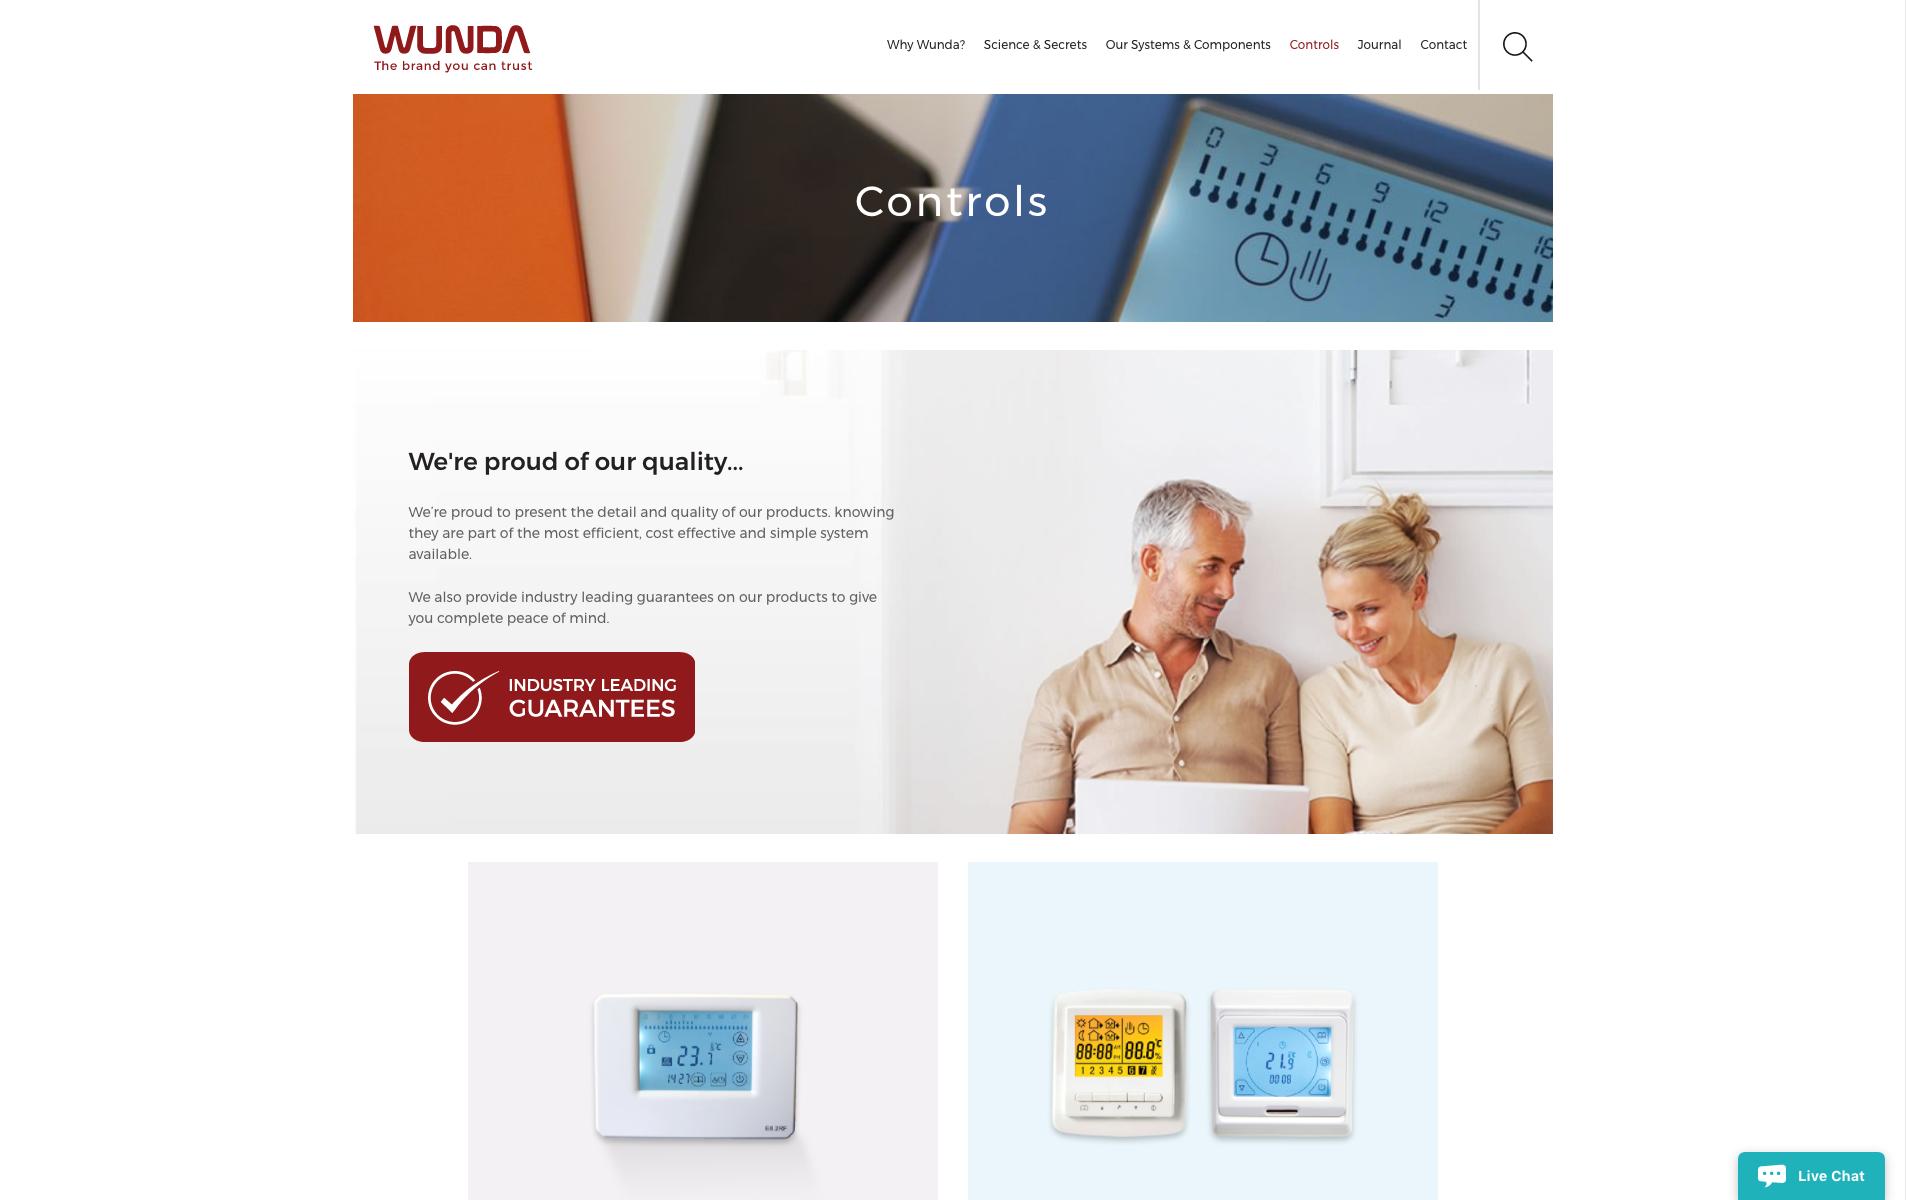 wunda-controls